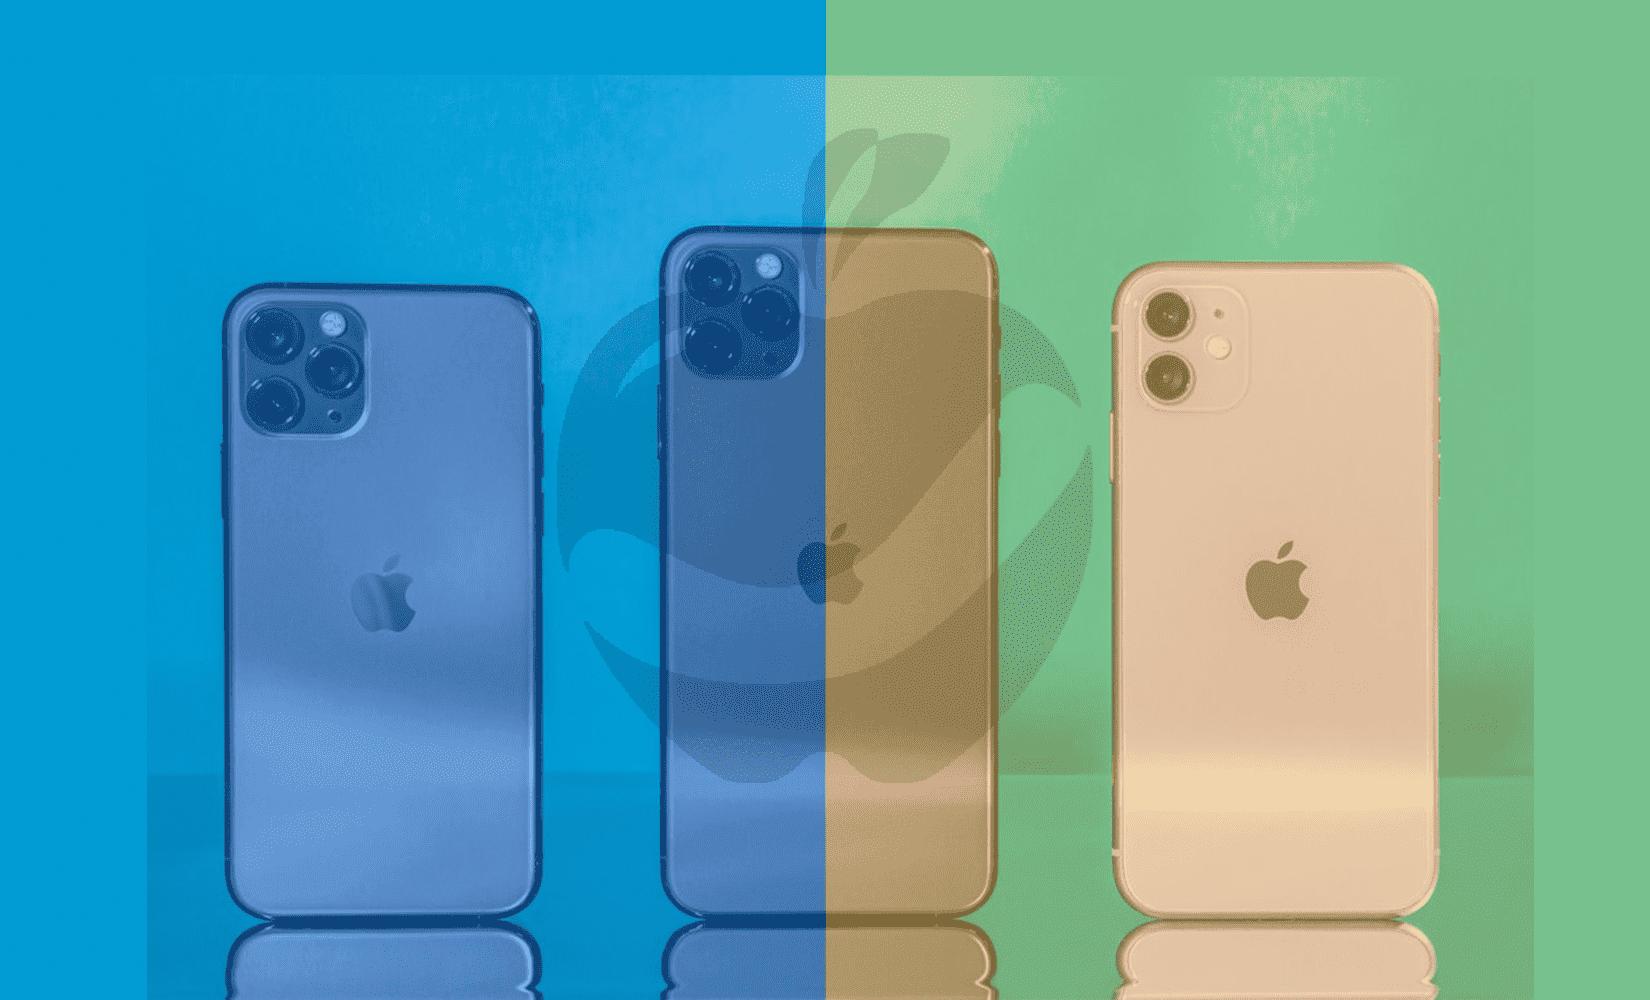 تفاصيل iPhone 12